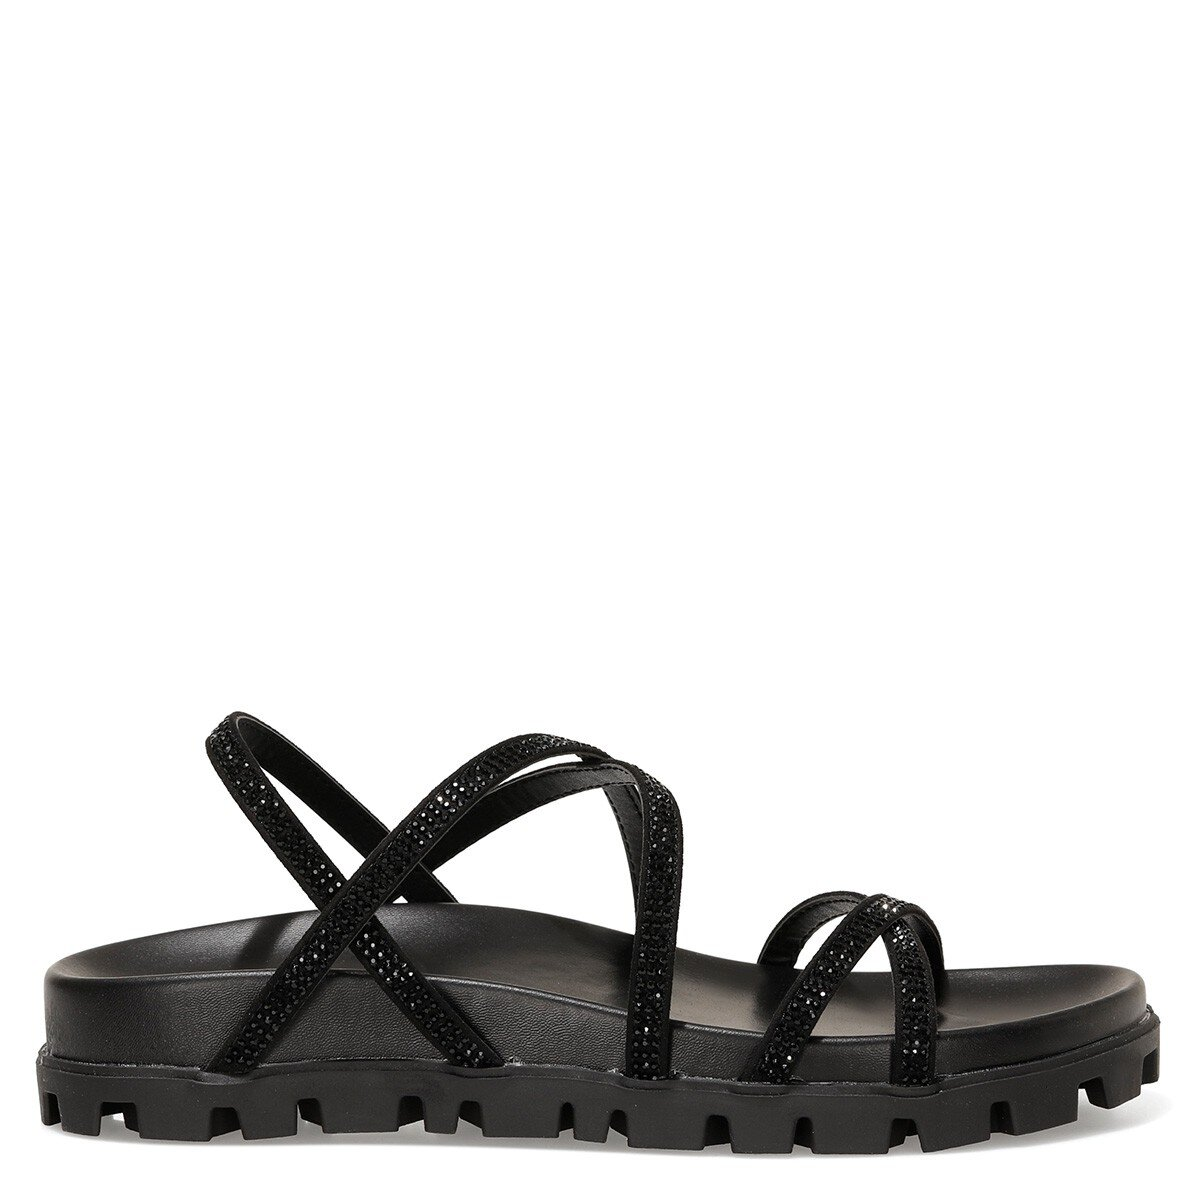 WADDA 1FX Siyah Kadın Düz Sandalet